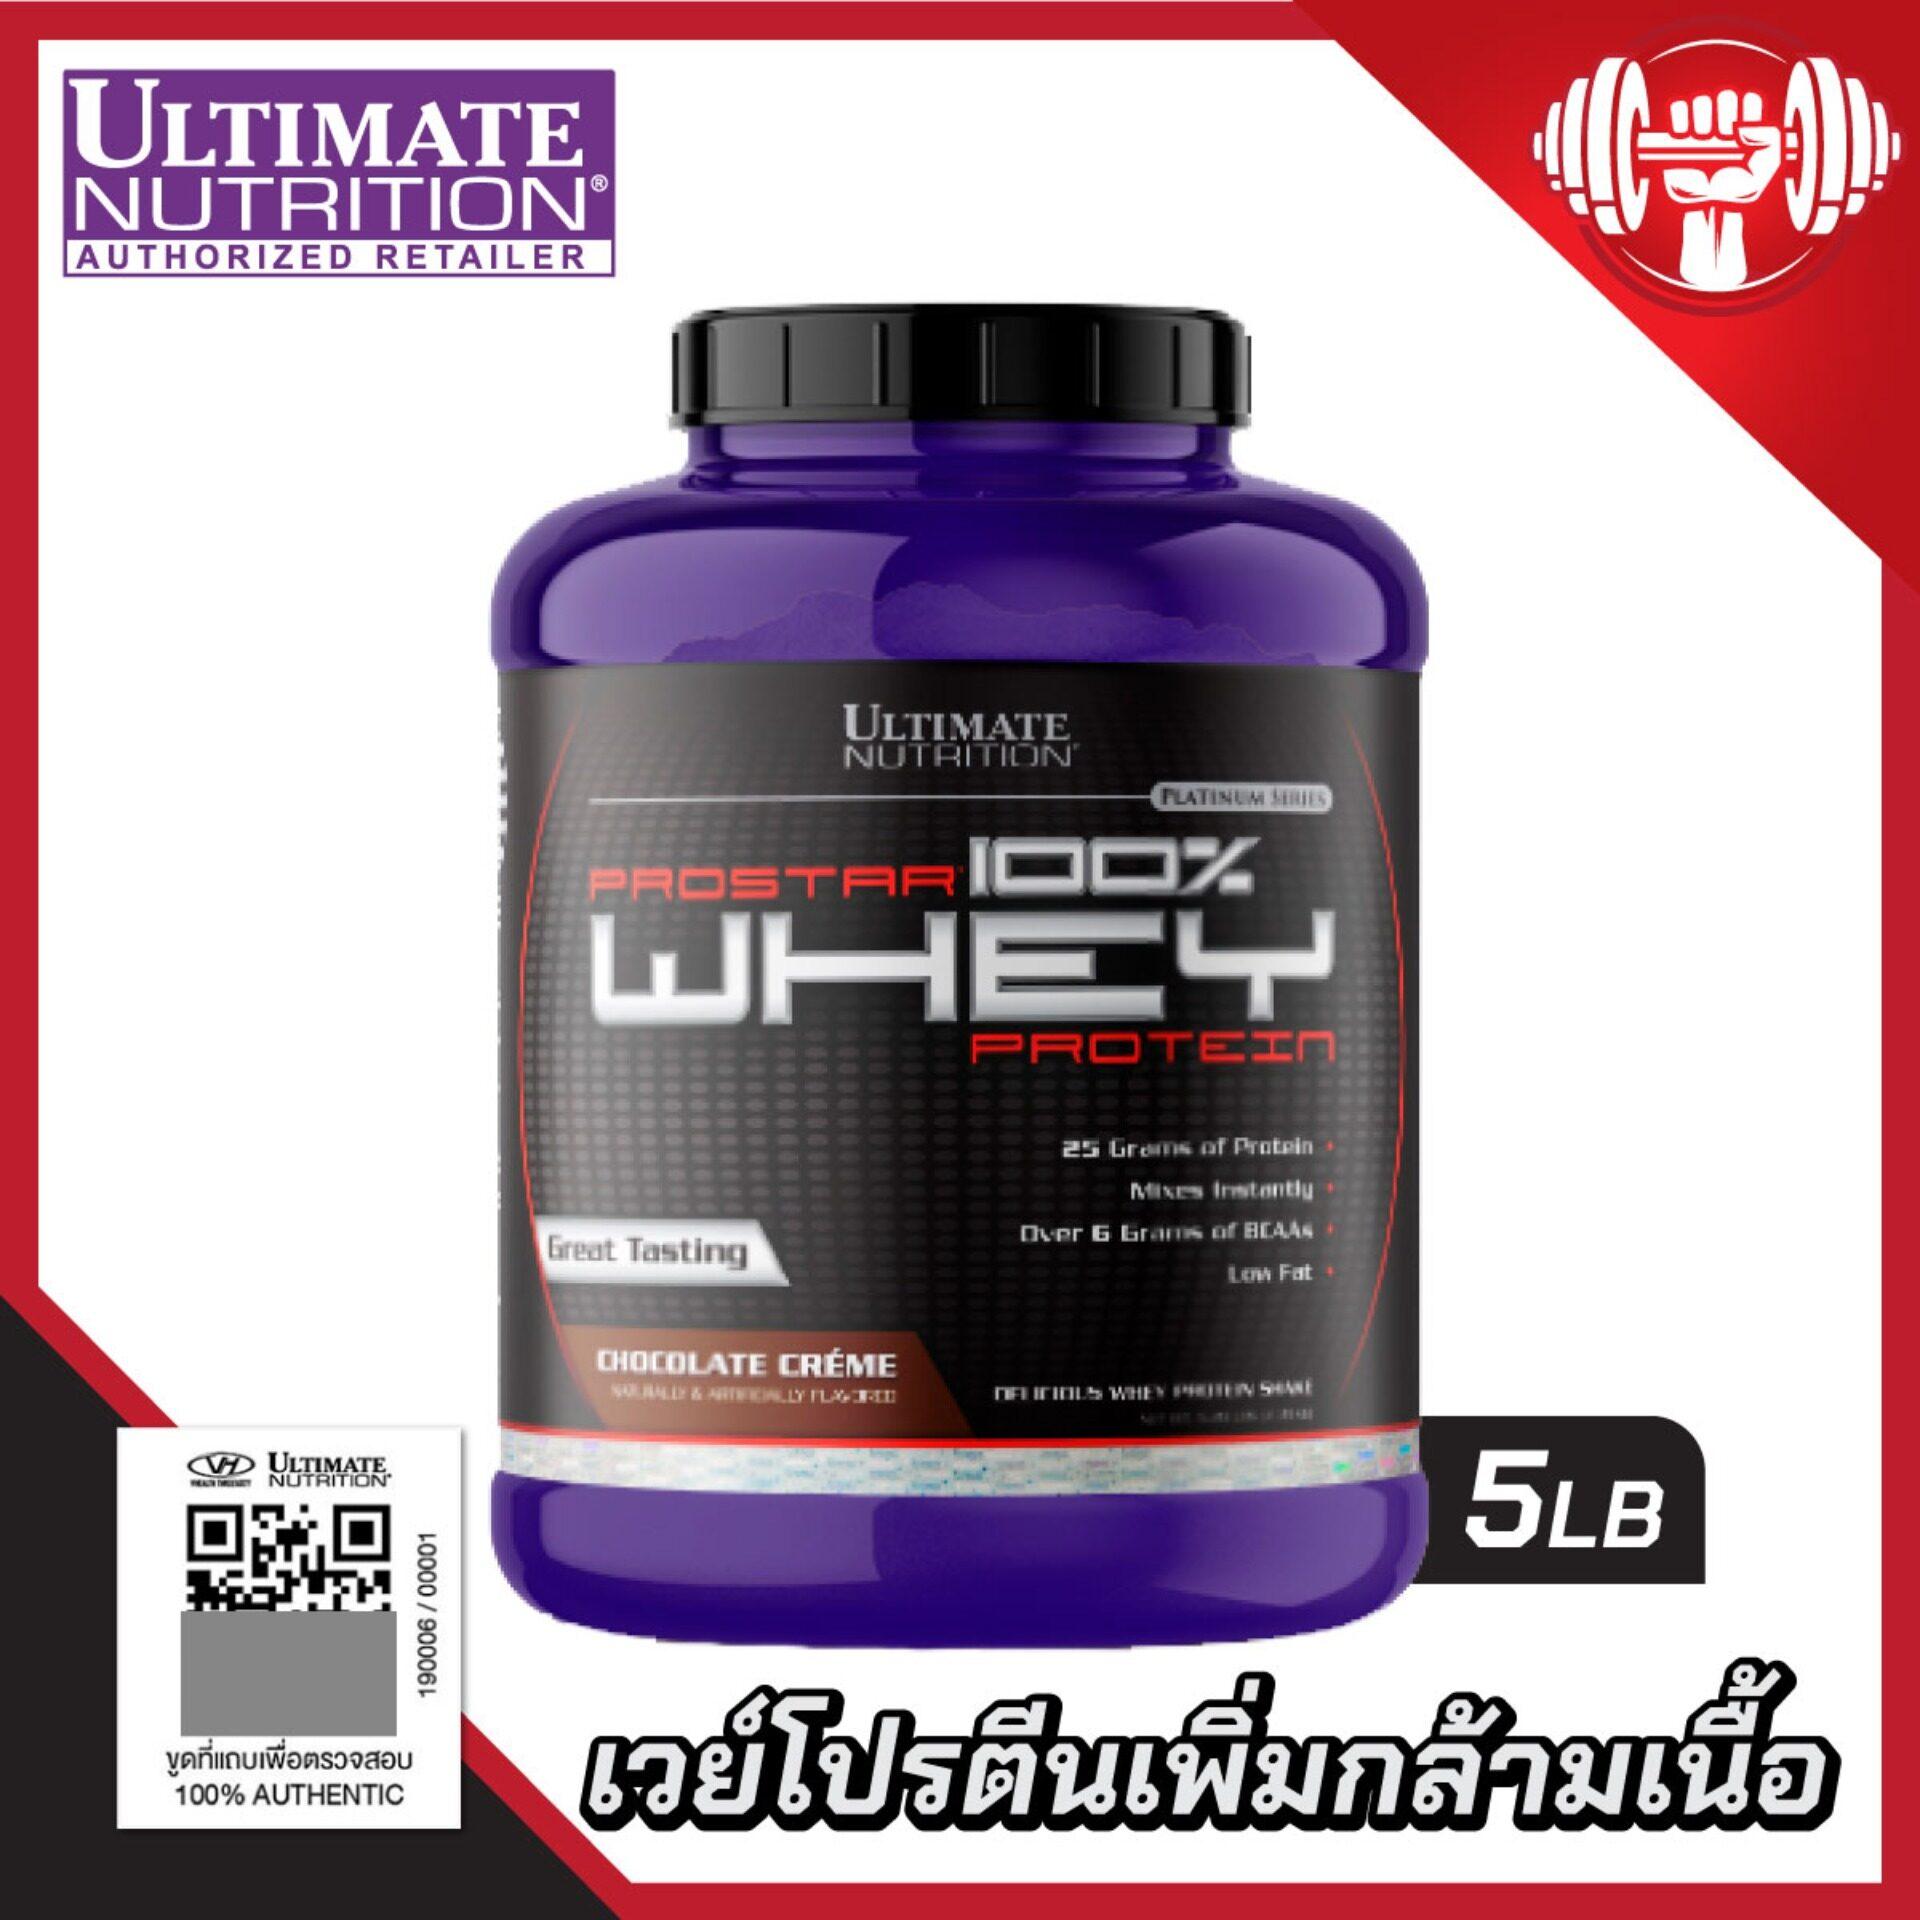 ULTIMATE NUTRITION - PROSTAR Whey Protein 5.28 Lbs พร้อมส่ง!!!